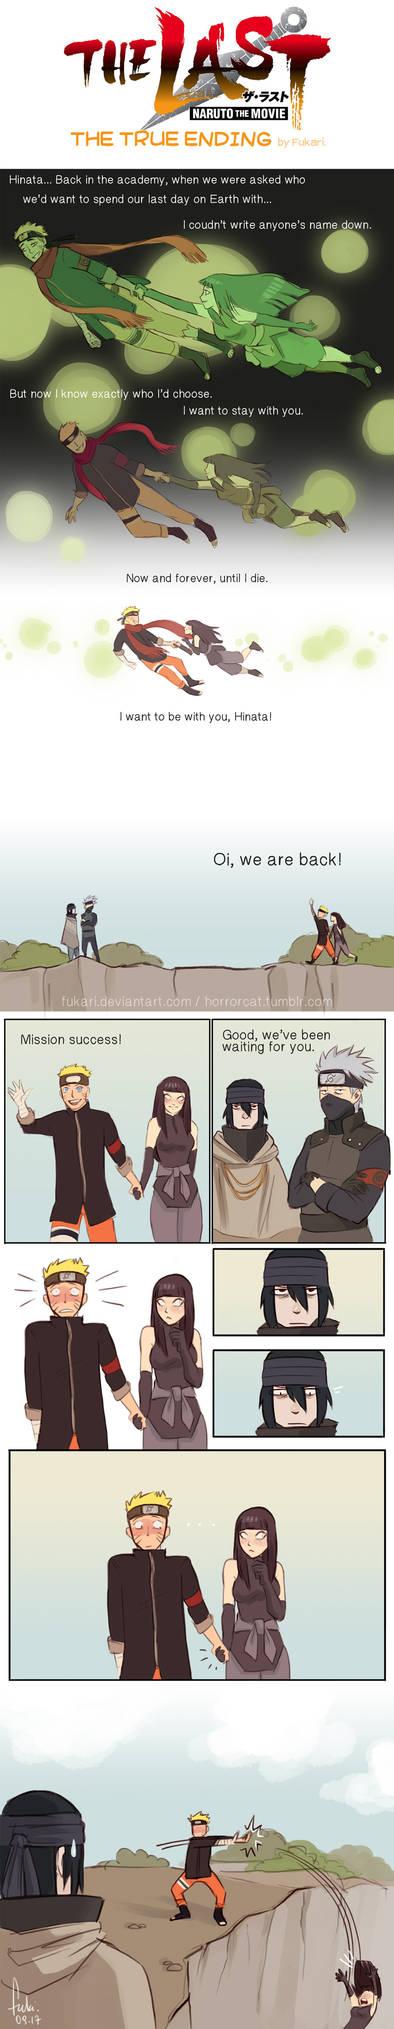 Naruto The Last - true ending